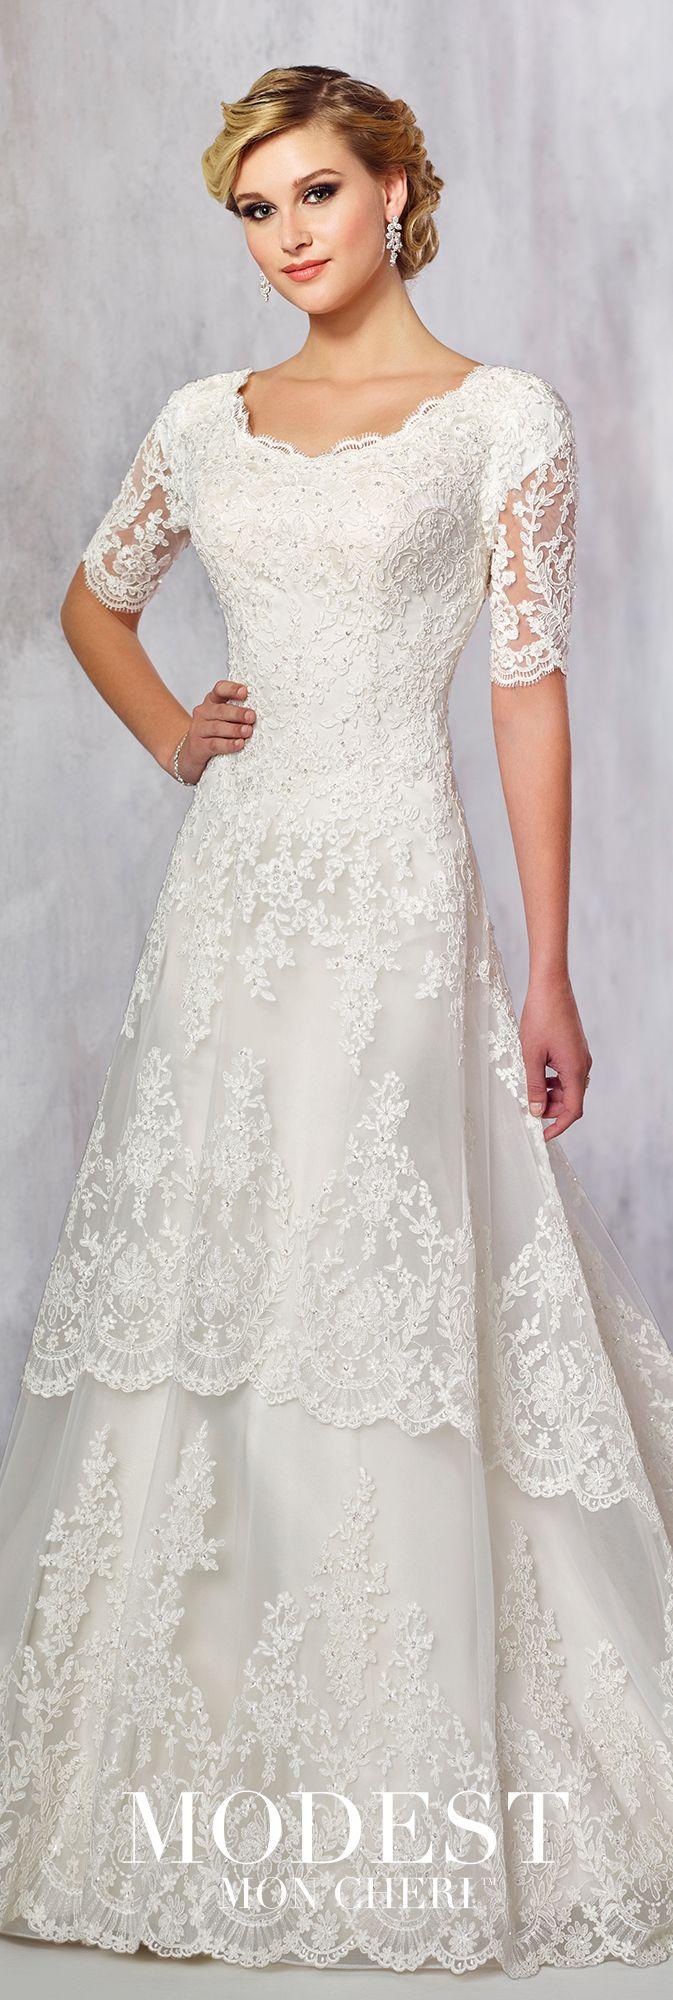 Short boho wedding dress  Modest Wedding Dresses Fall  Collection  Style TR  short